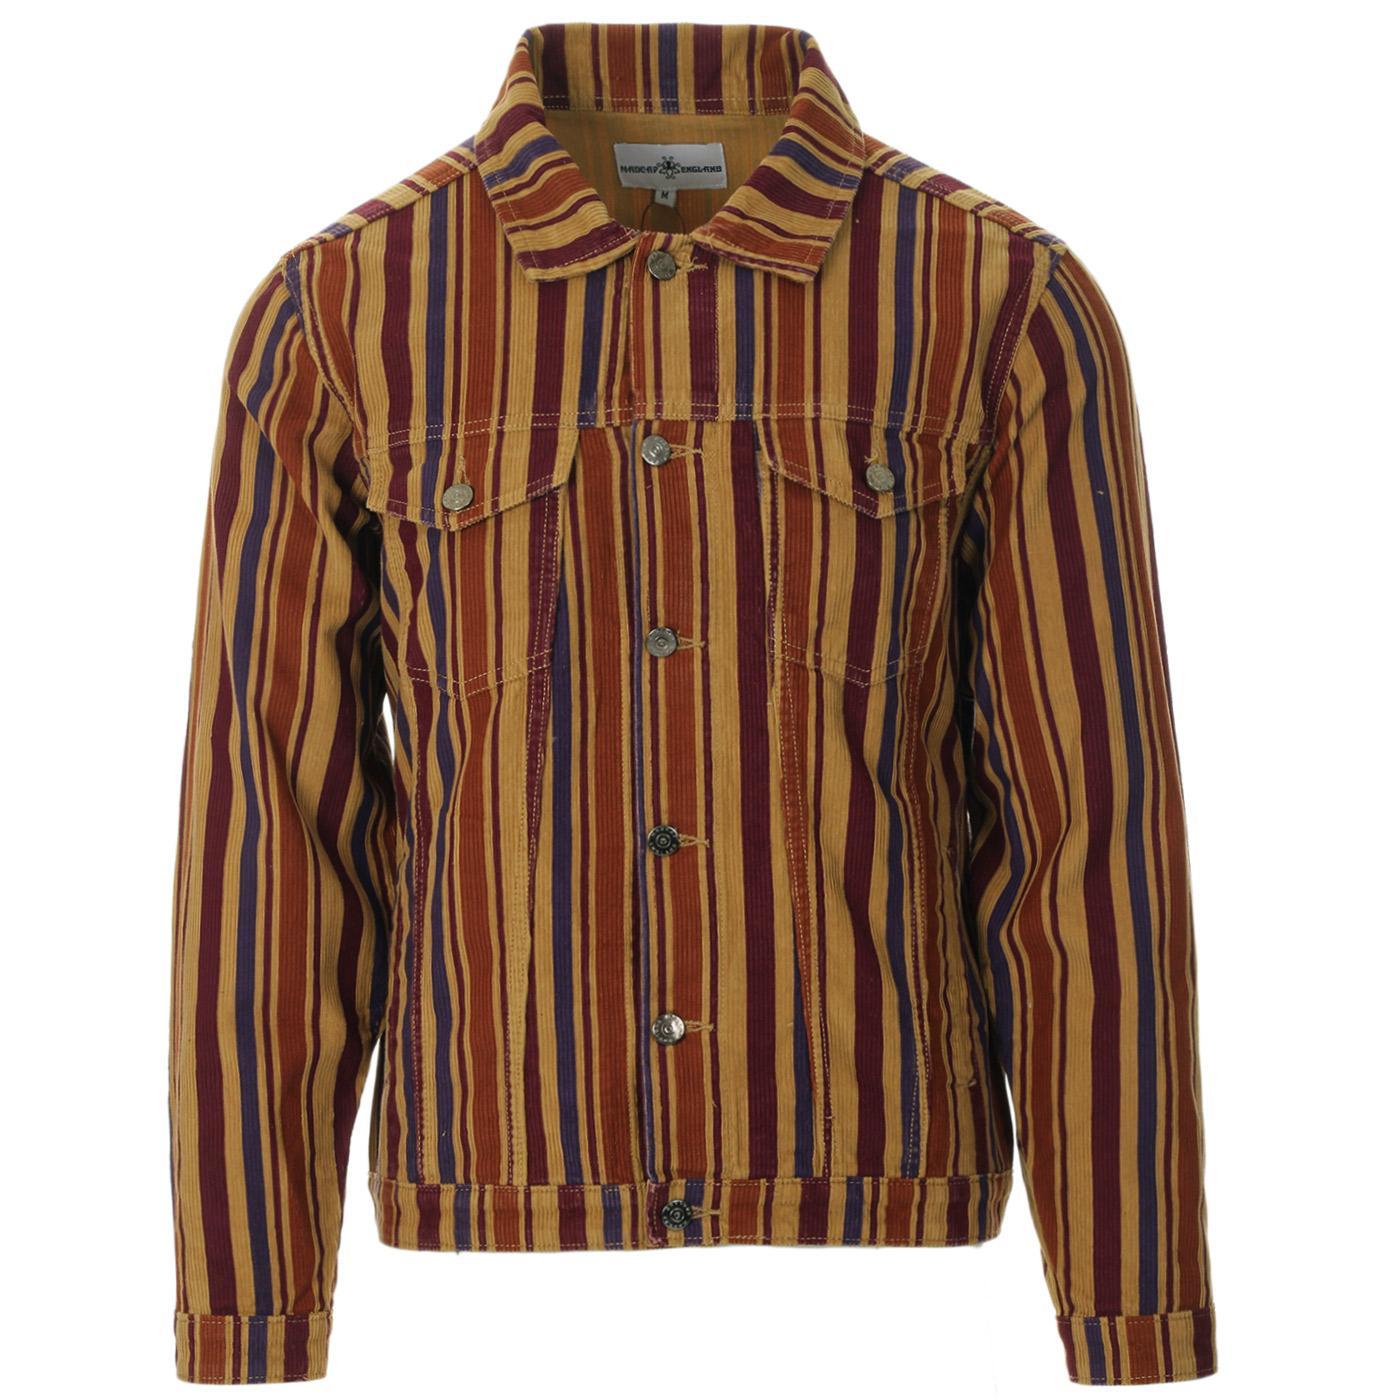 Woburn Stripe MADCAP ENGLAND Cord Trucker Jacket